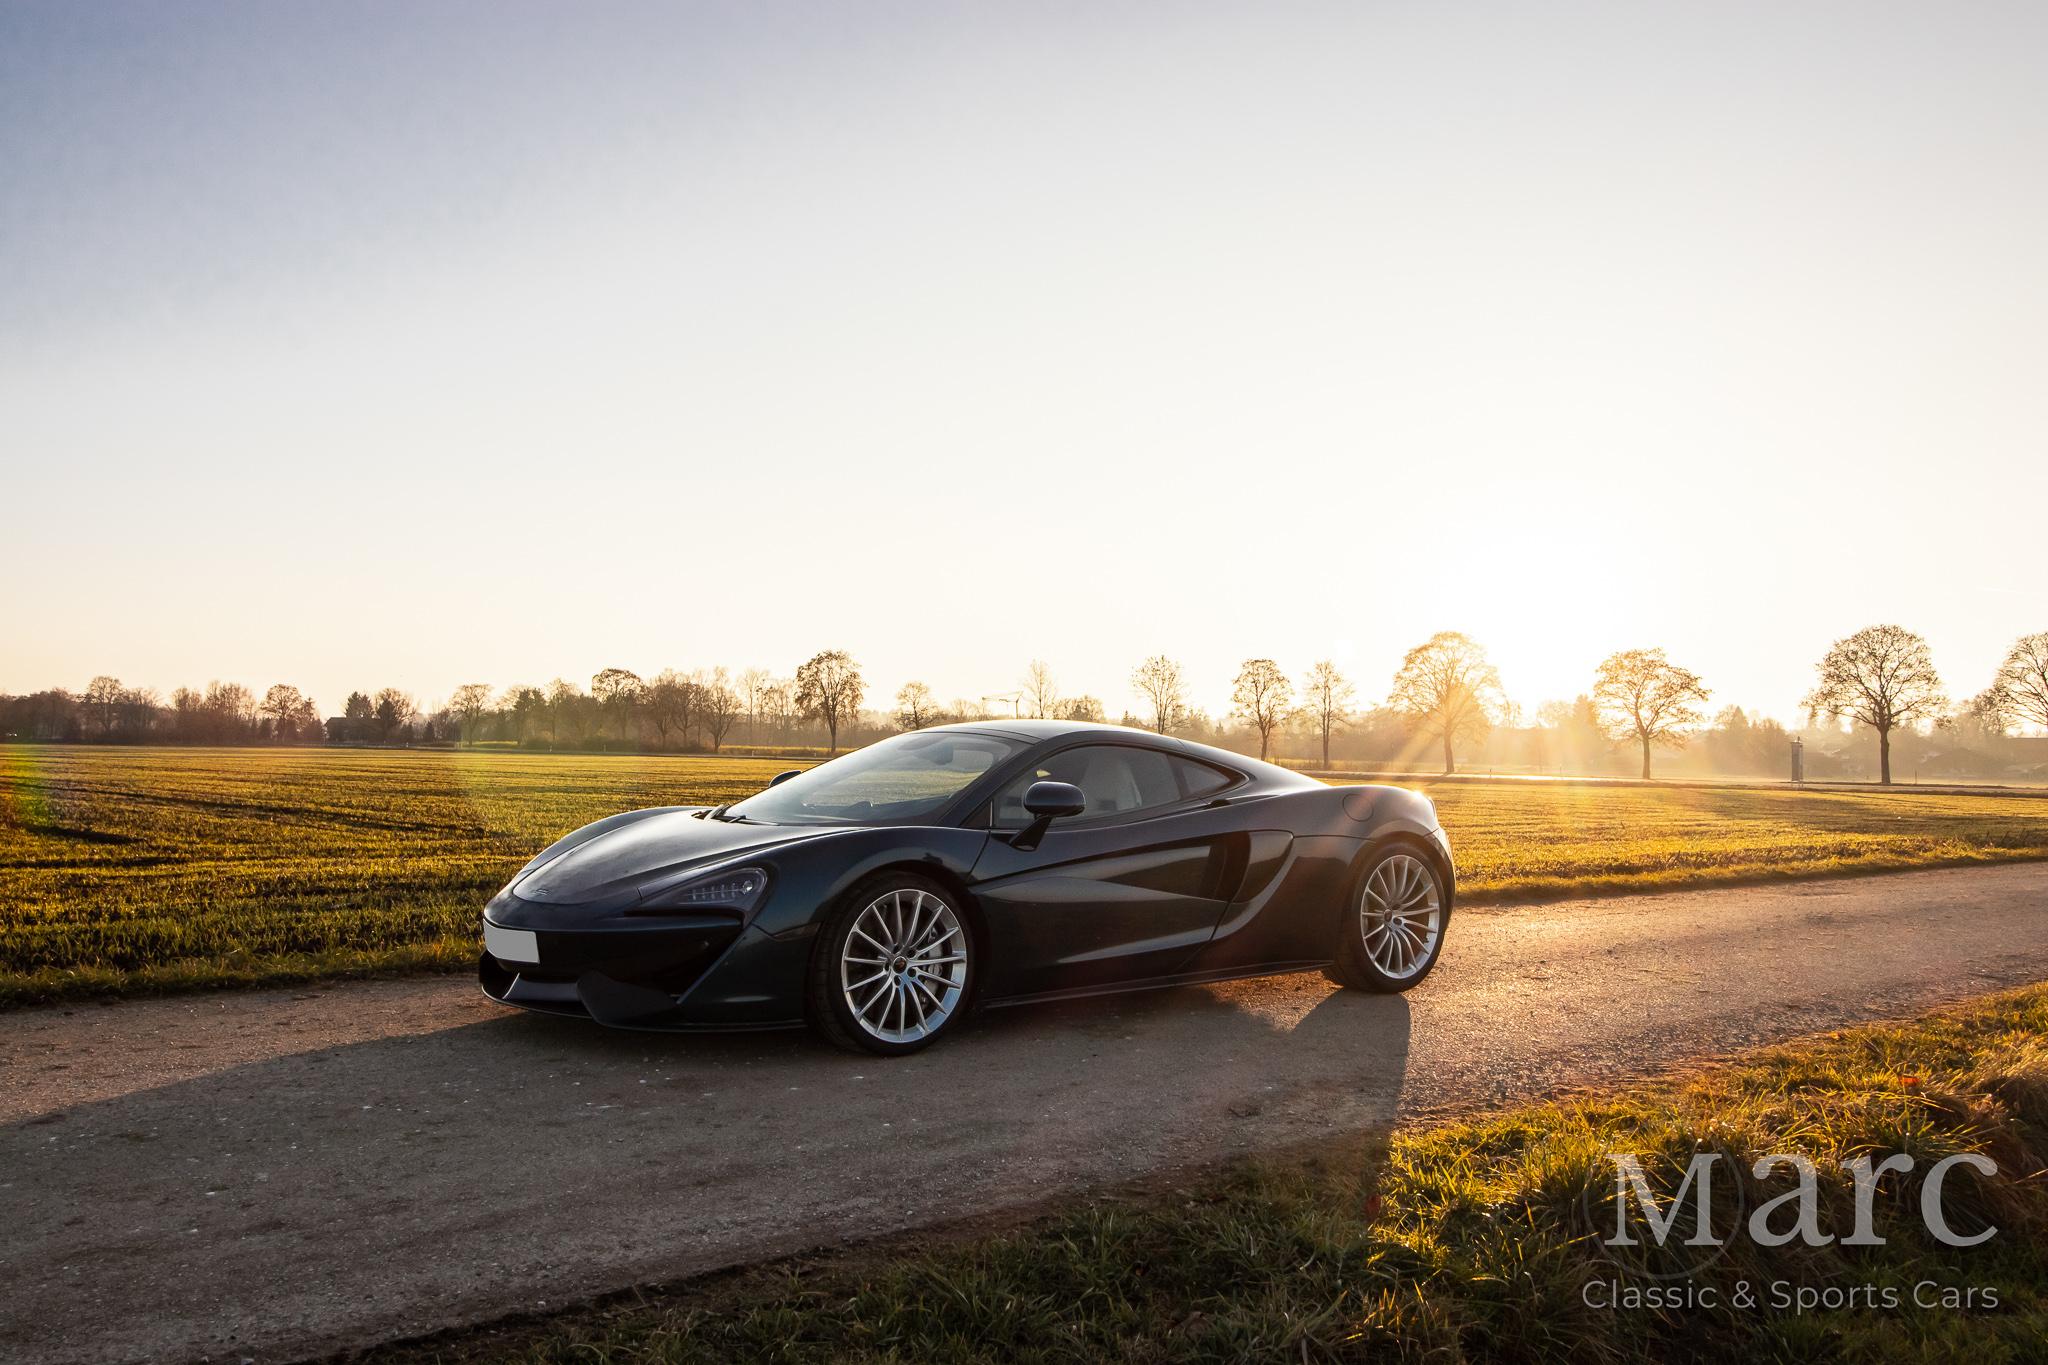 McLaren 570GT bei marc sportscars